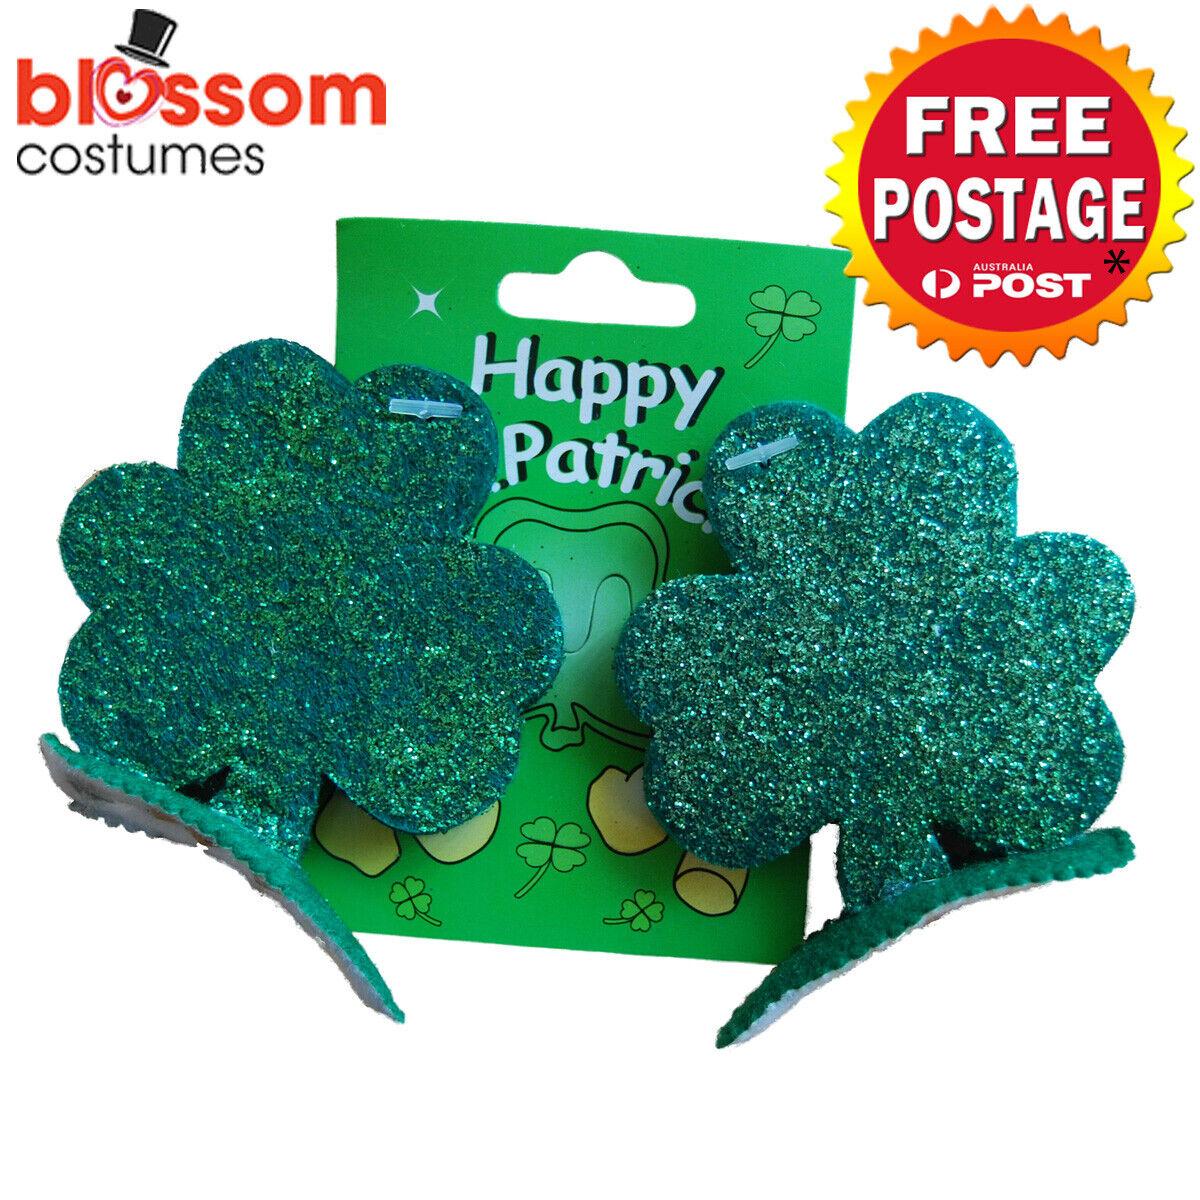 AS253 St Patricks Irish Day Green Shamrock Hair Clips Costume Accessory Glitter